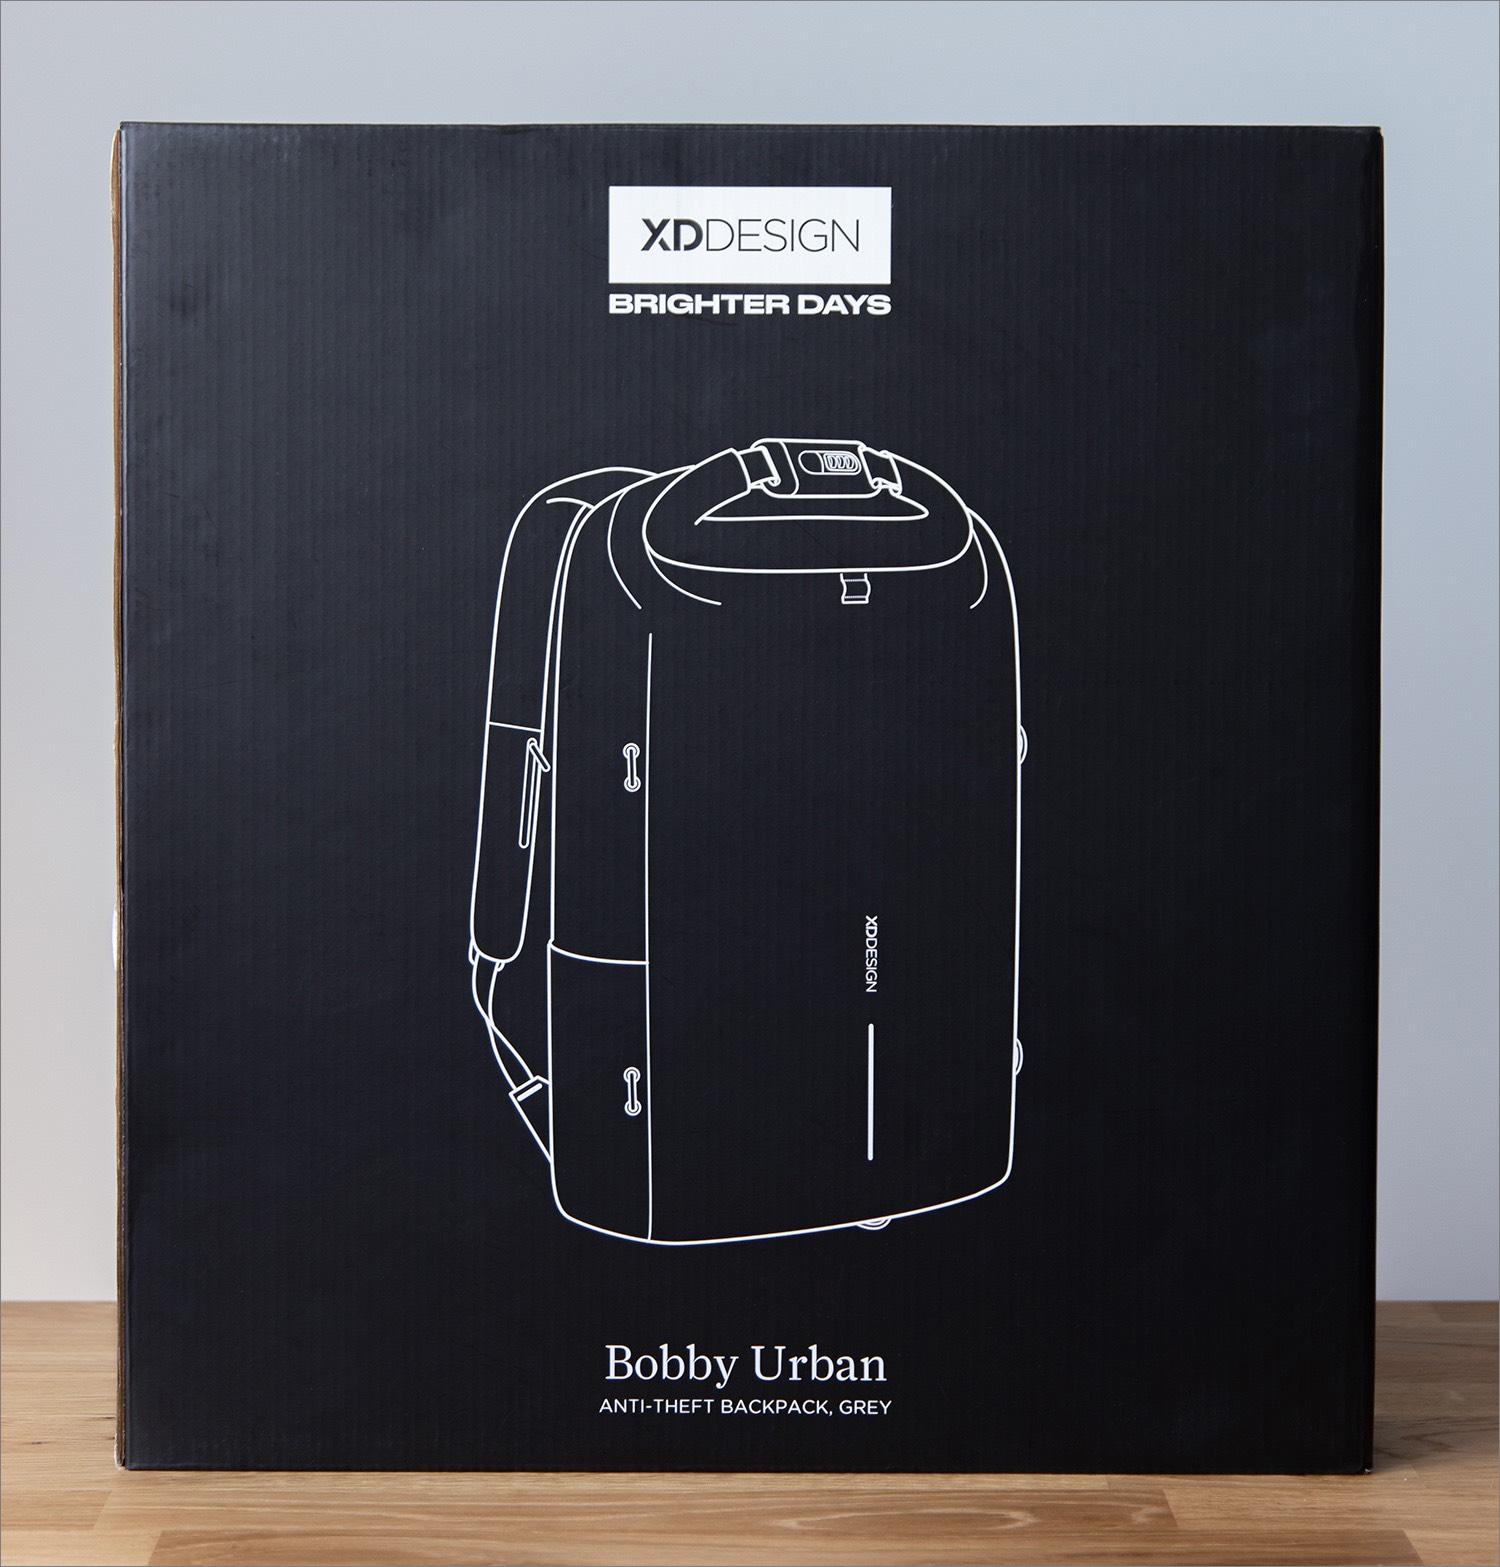 Рюкзак Bobby Urban: внутренний мир под замком - 2